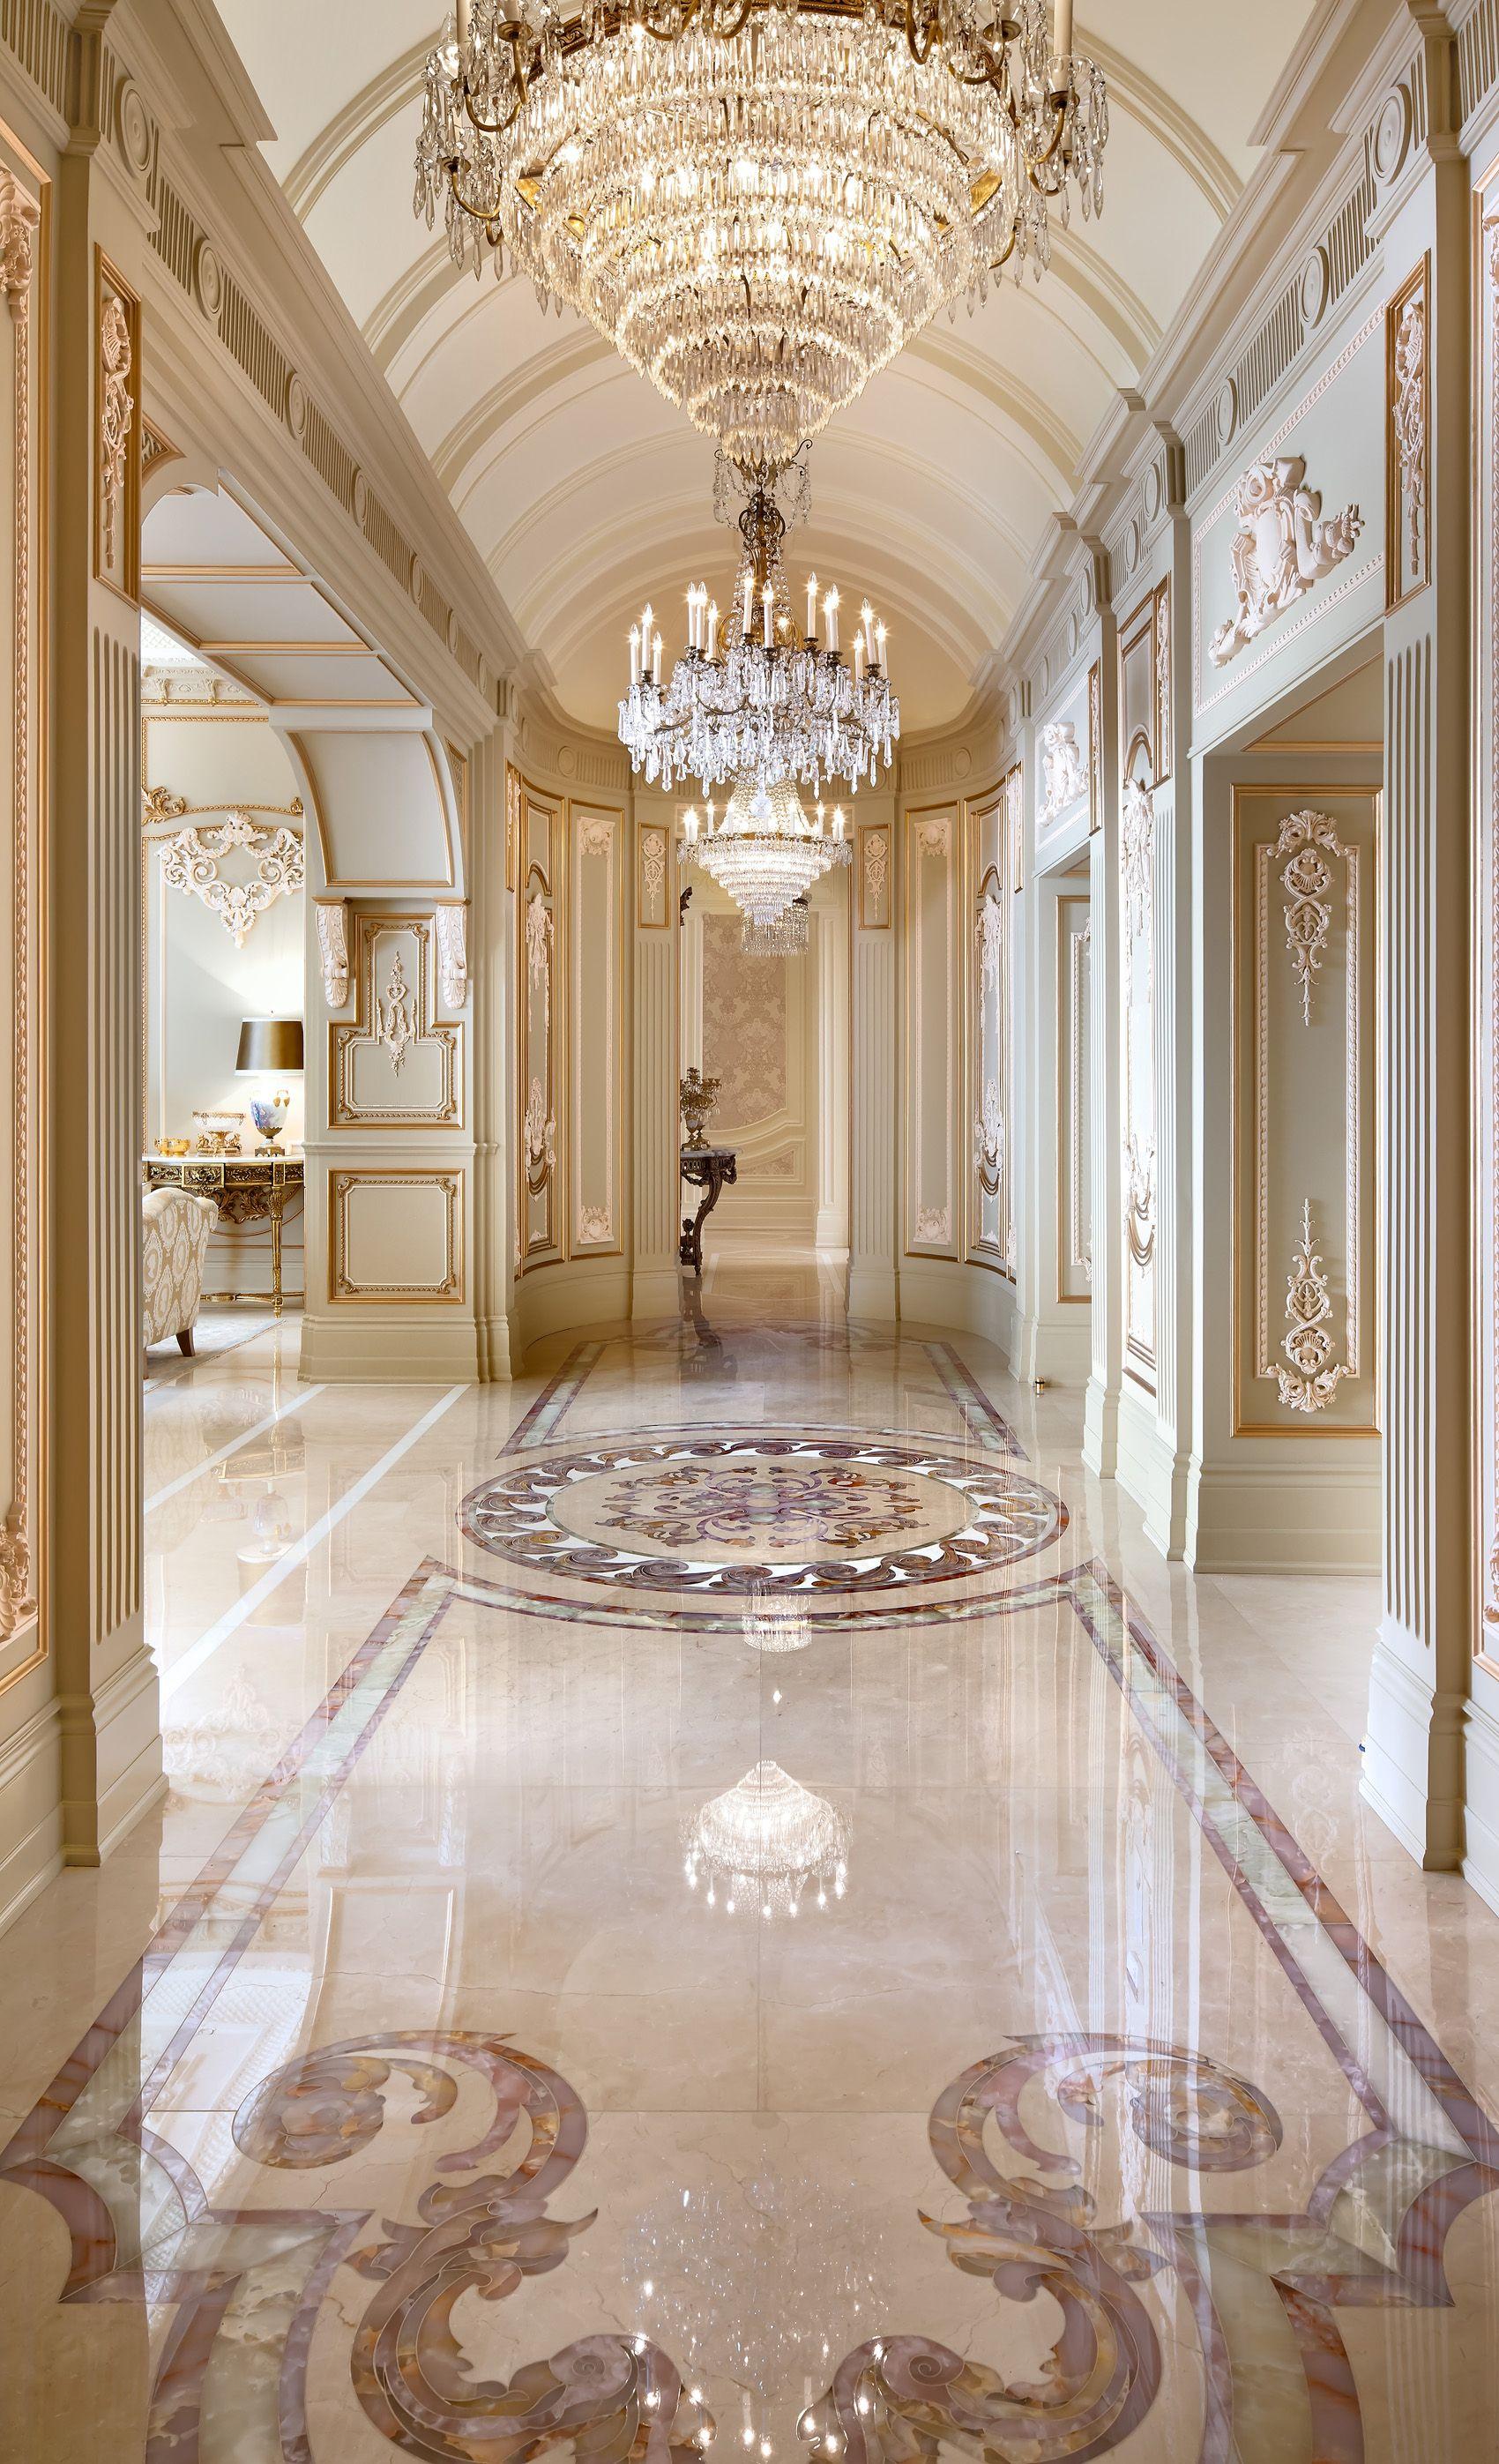 Luxury Interior Design: Toronto Four Seasons By LORI MORRIS